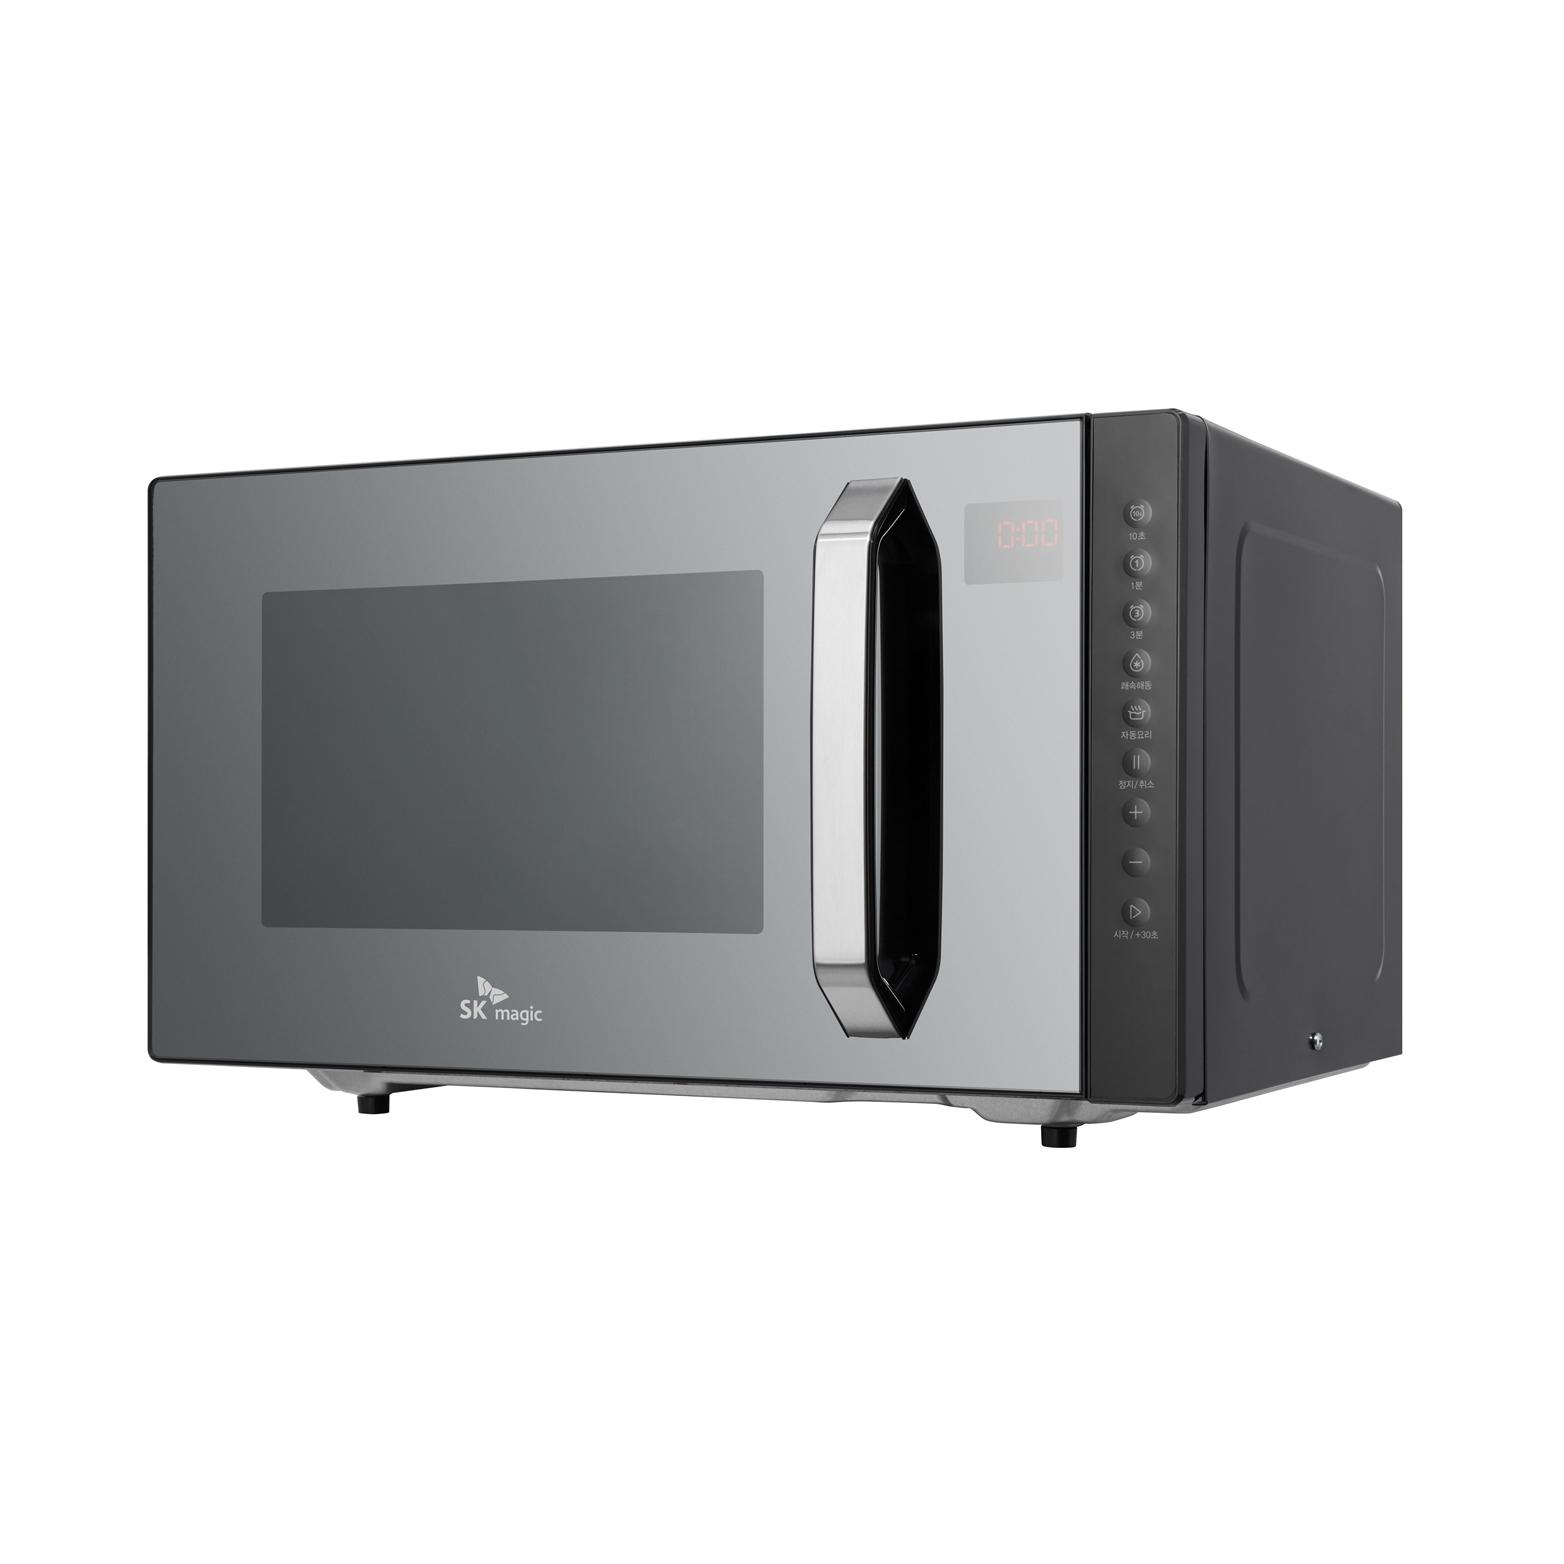 SK매직 자동요리 전자식 전자레인지 23L, MWO230KL